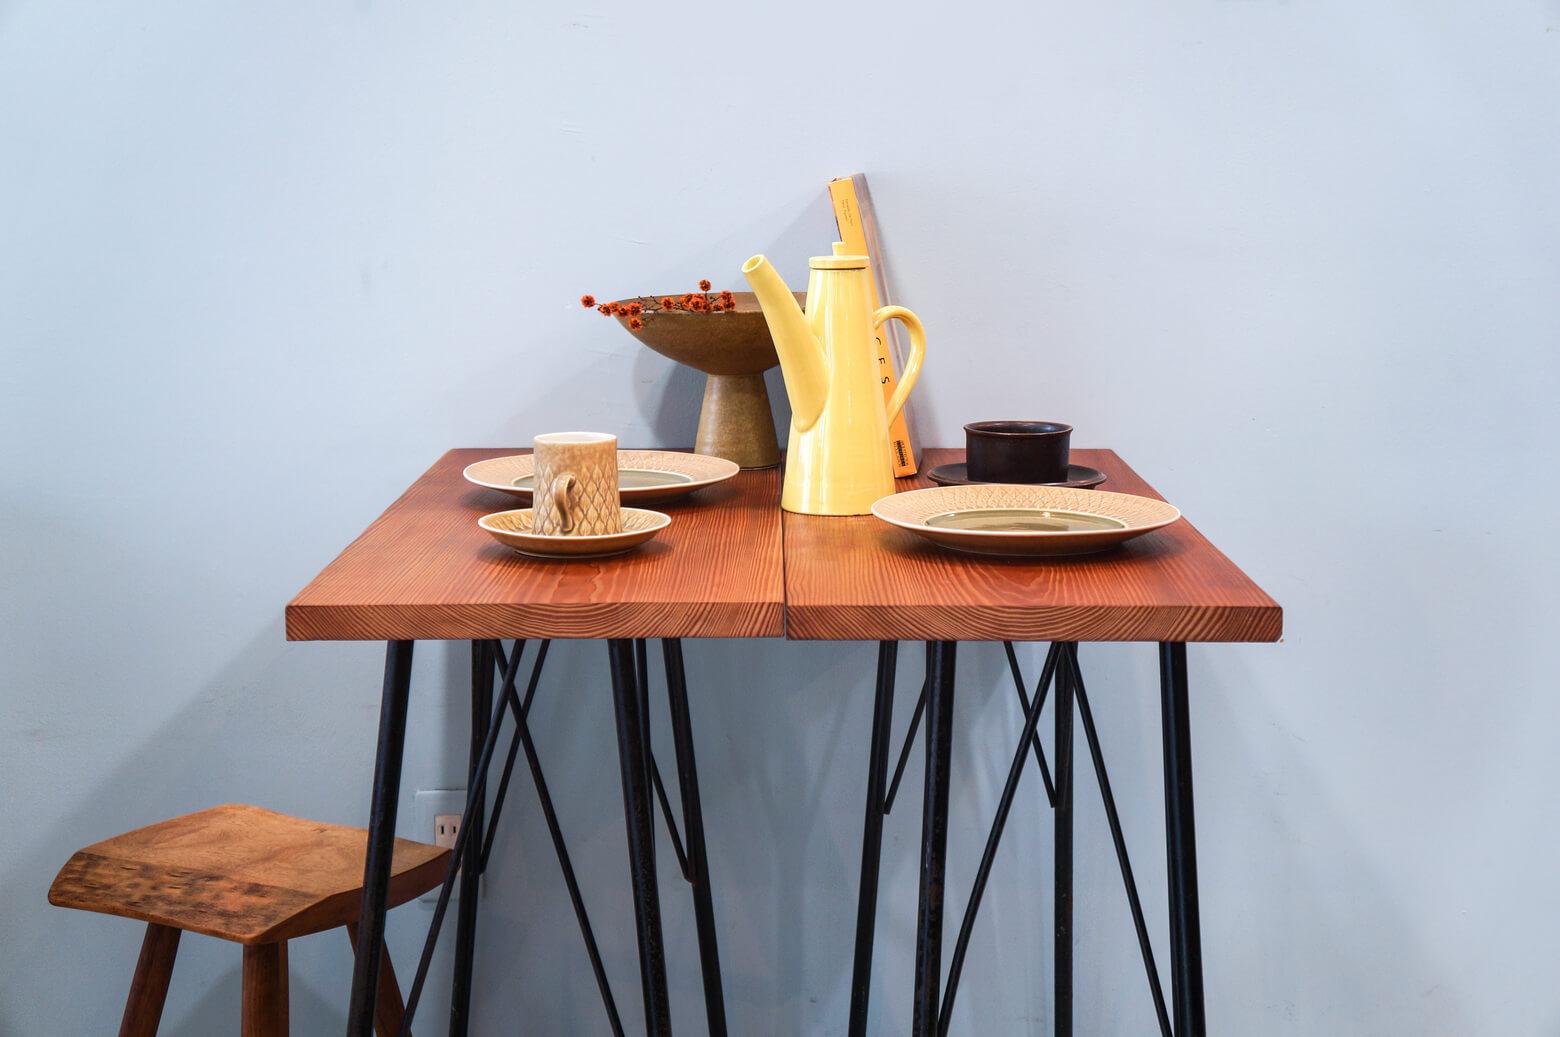 Solid wood Remake Table/無垢 一枚板 アイアンレッグテーブル 鉄脚 アンティーク インダストリアル